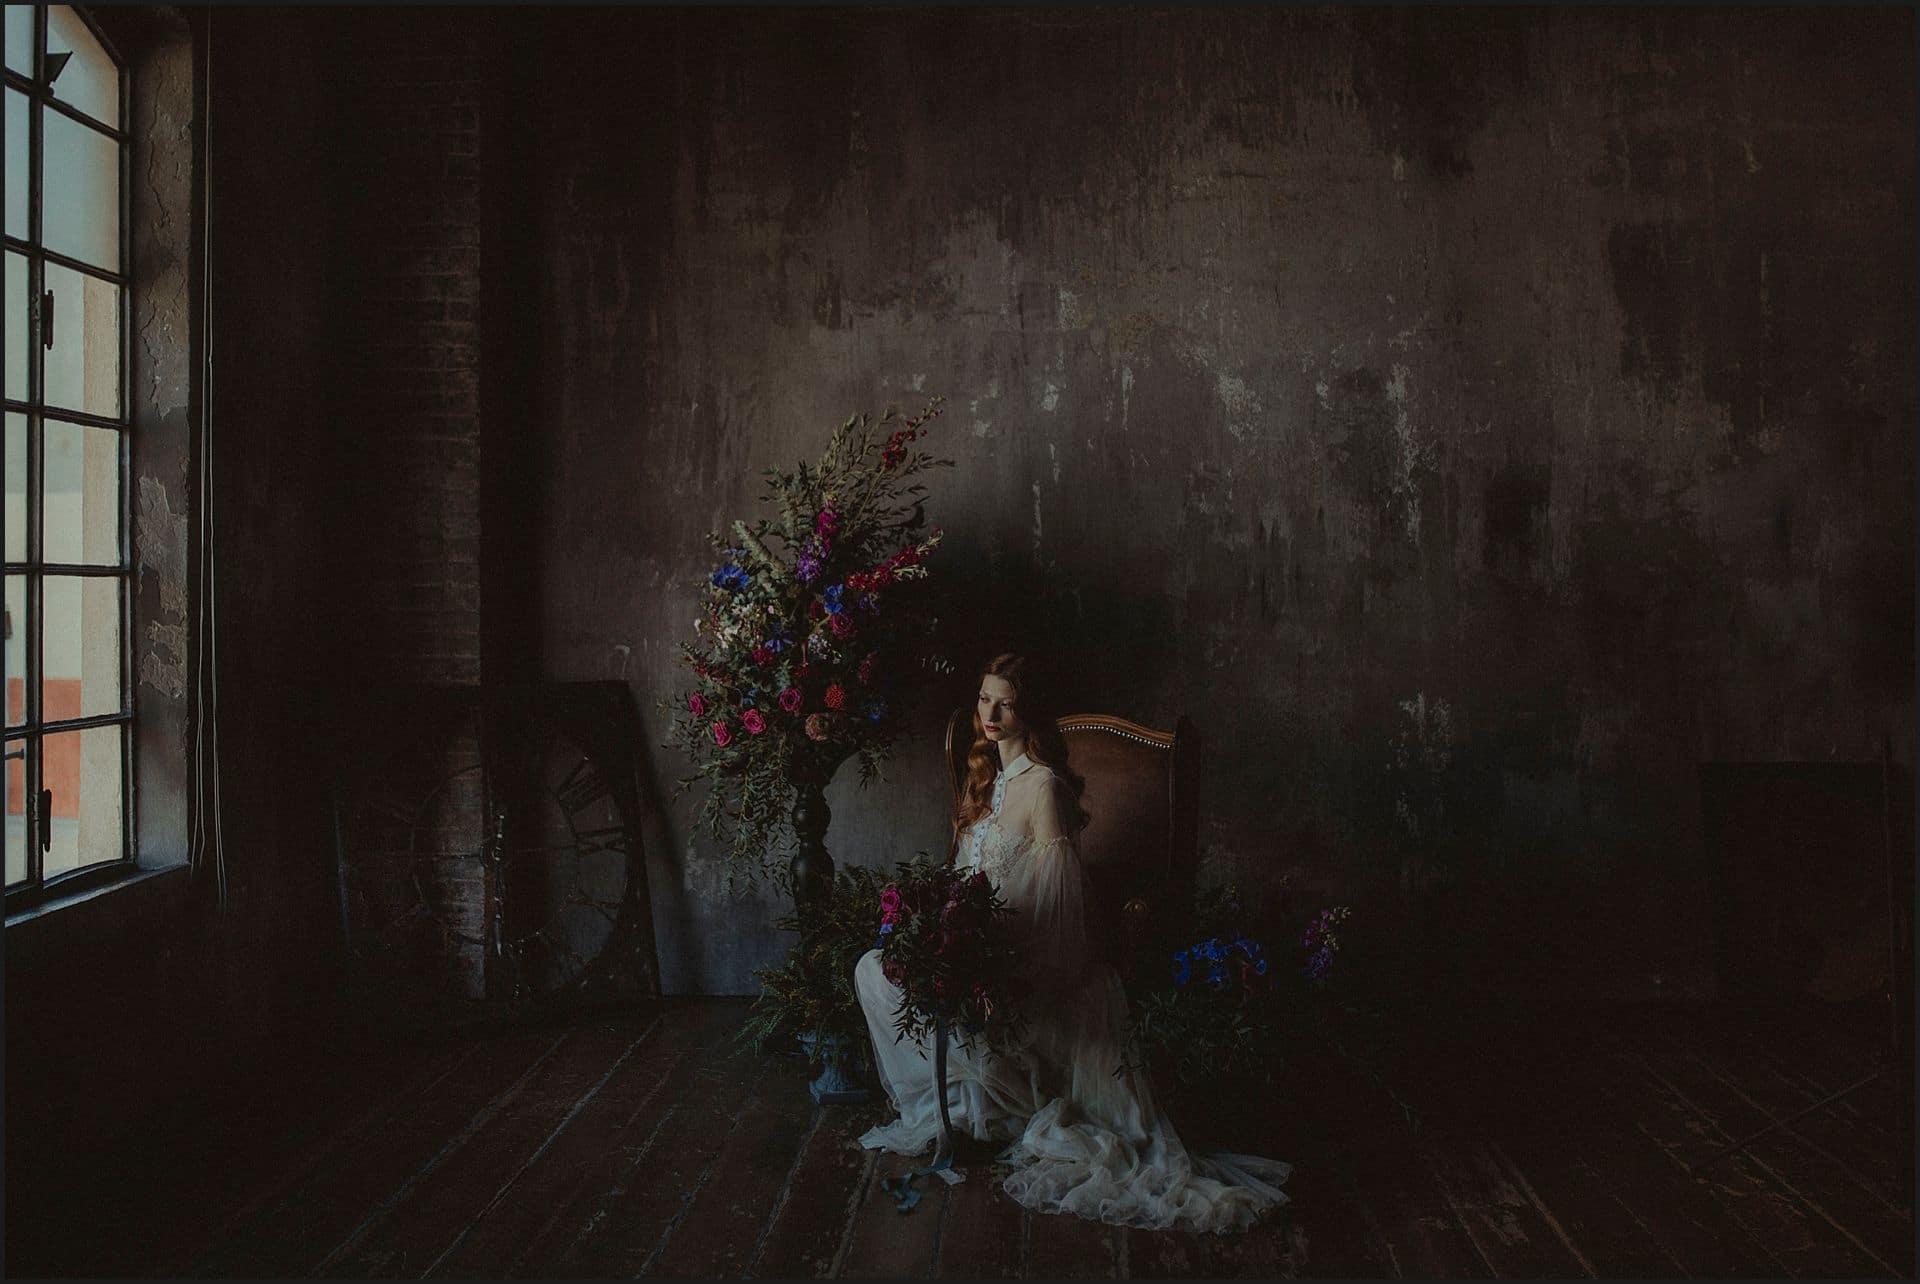 bride portrait, wedding flowers,dark mood, decadence, fine art wedding, alternative wedding, unconventional wedding, cross studio, milan, wedding photographer, wedding in italy